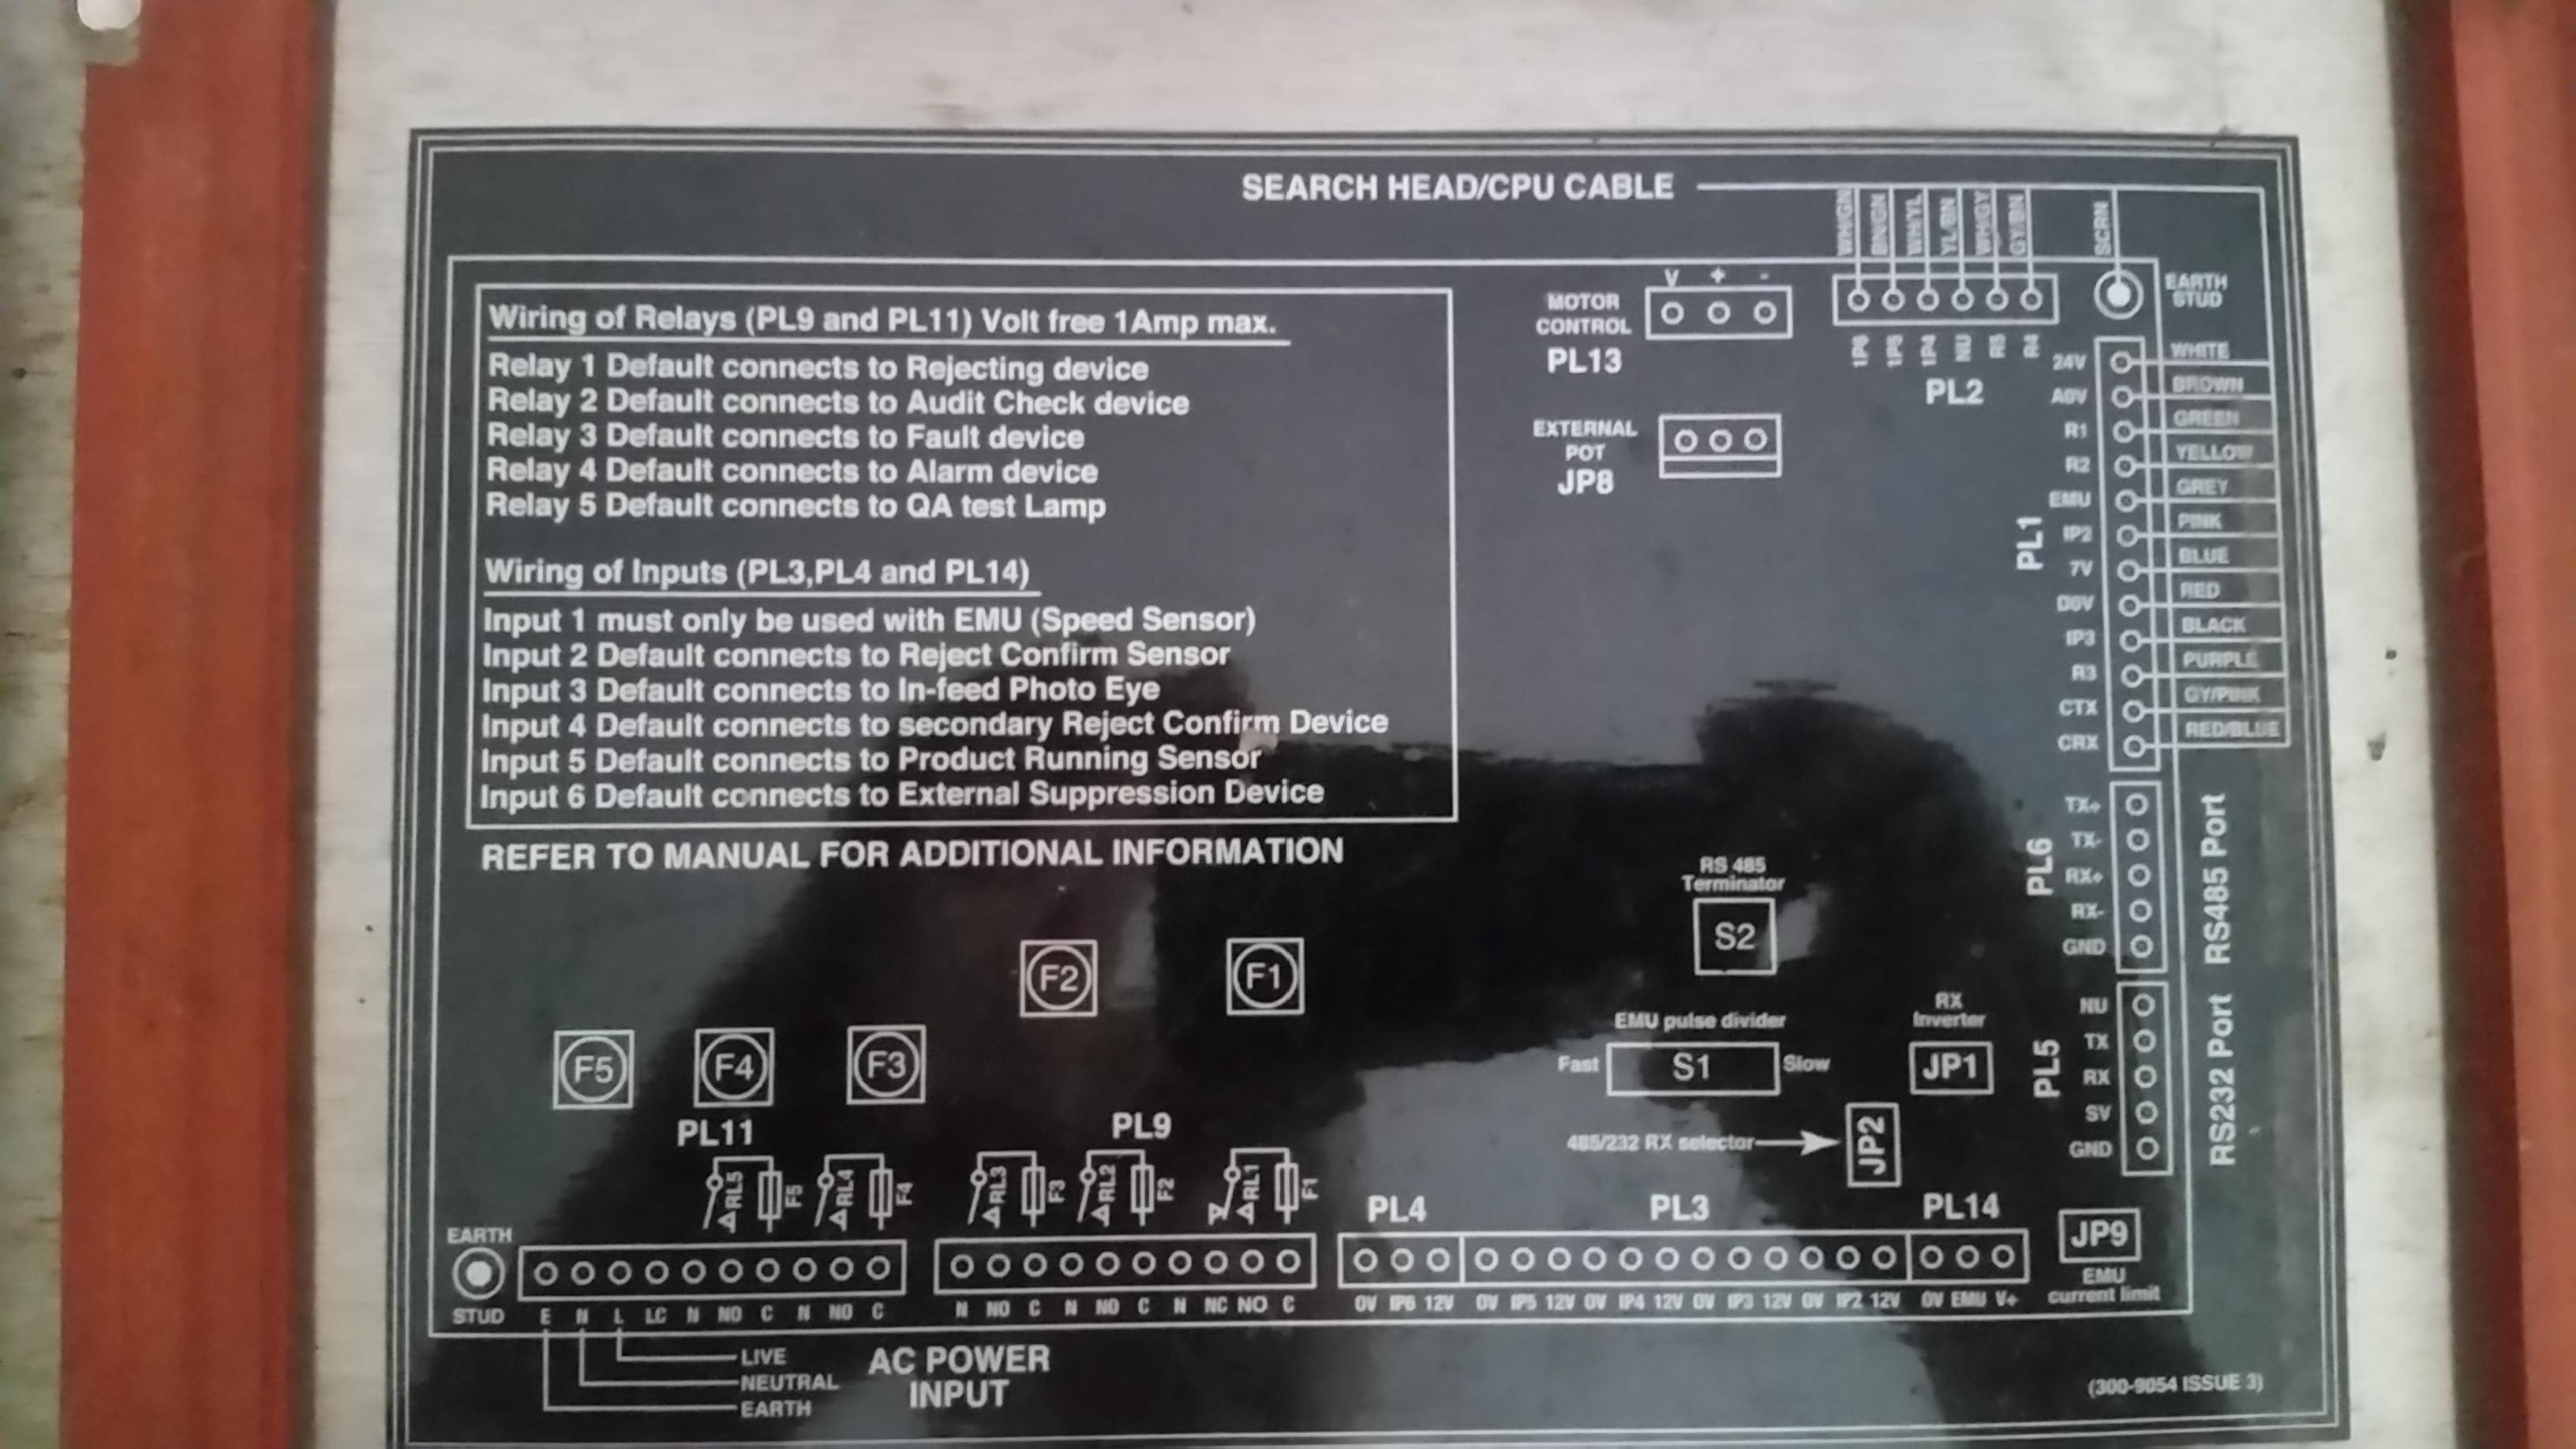 Thermo Goring Kerr Model DSP 3 Metal Detector S/N 06298304 - LOCATION - LONDON, ONTARIO - Image 4 of 4